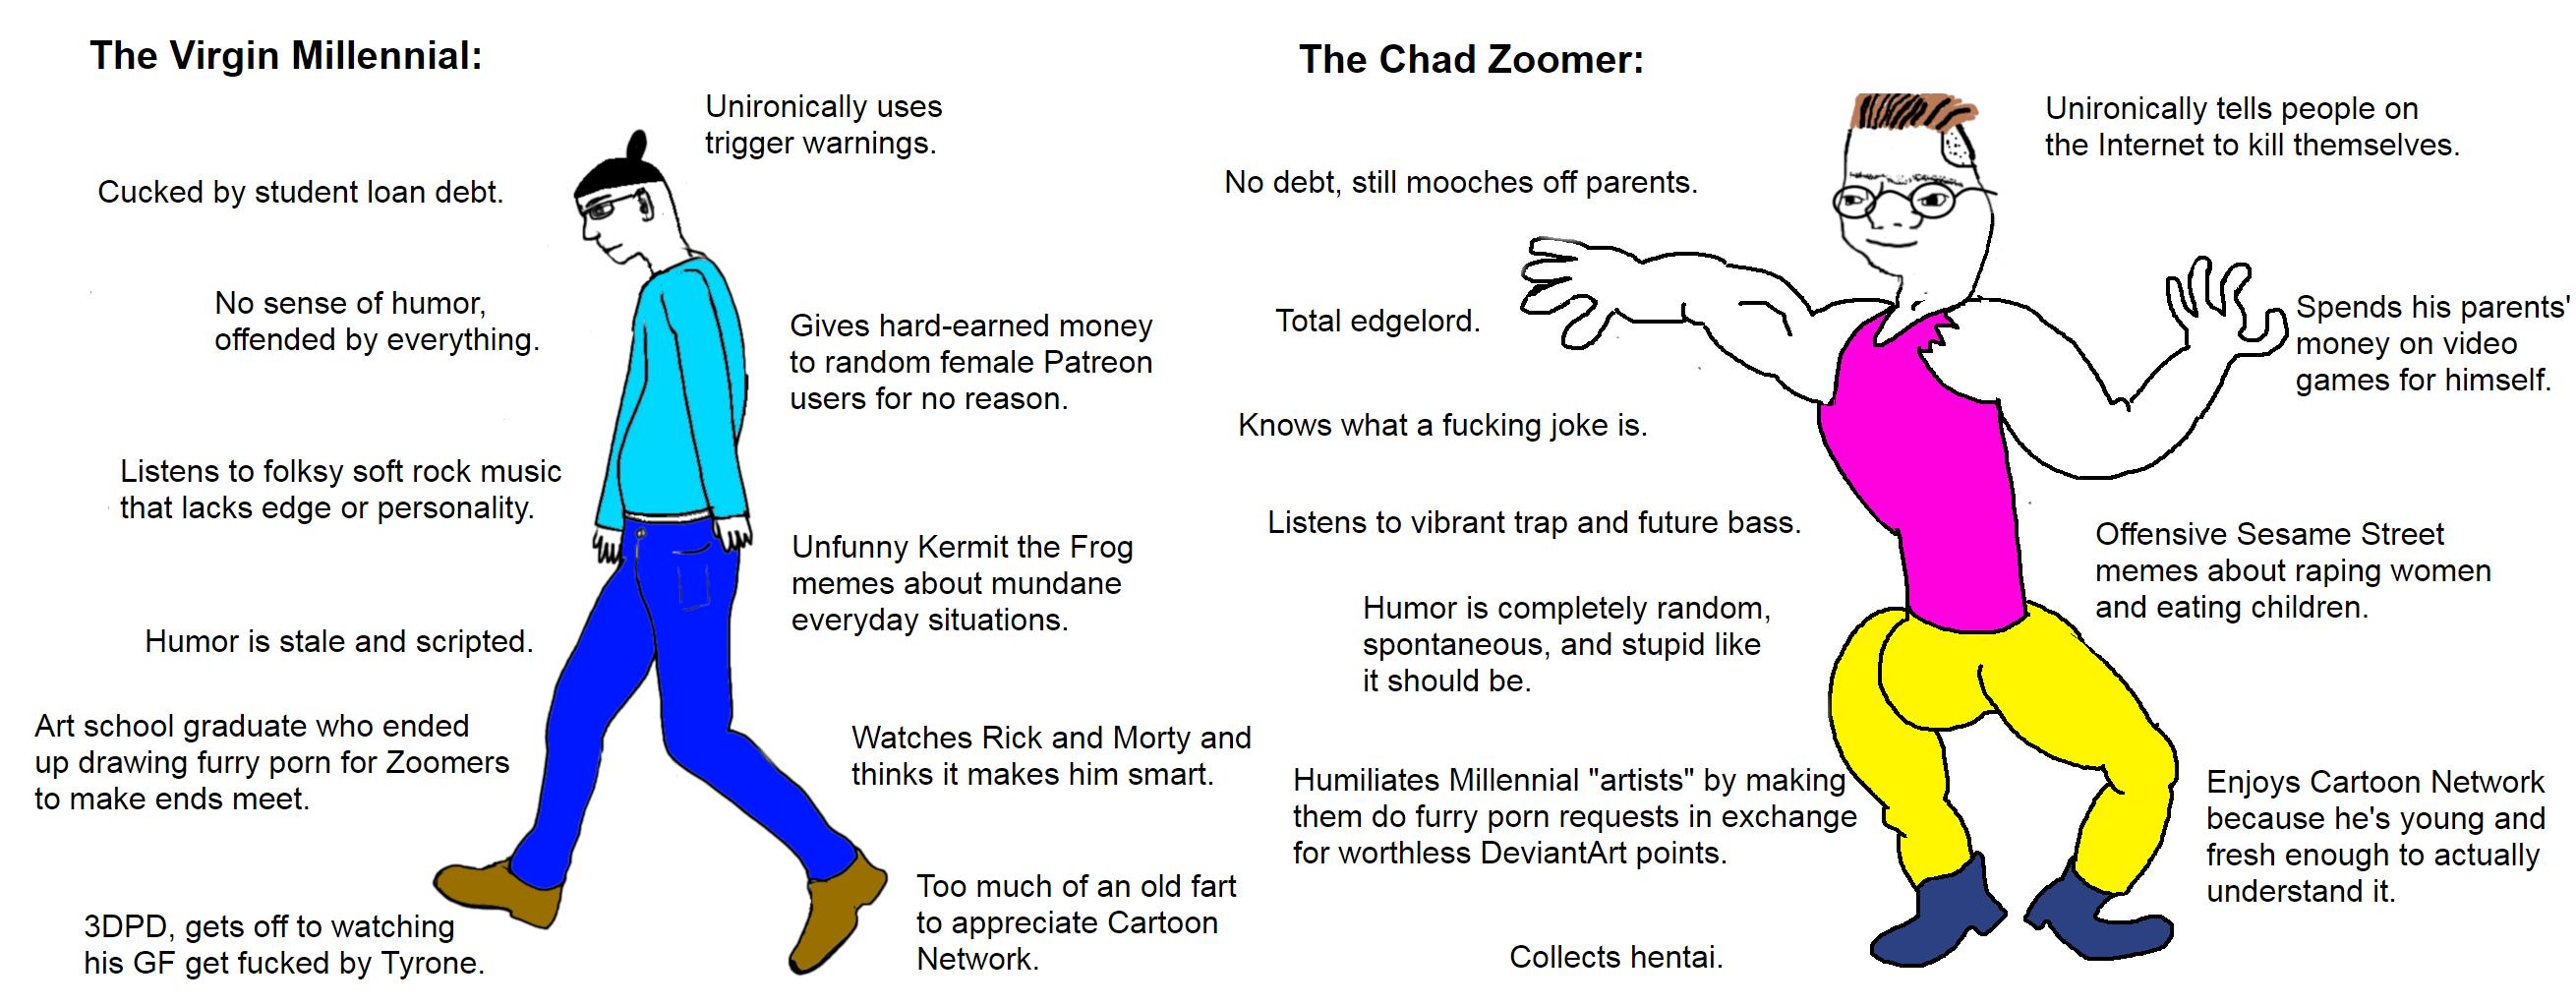 doomer gf and chad gf